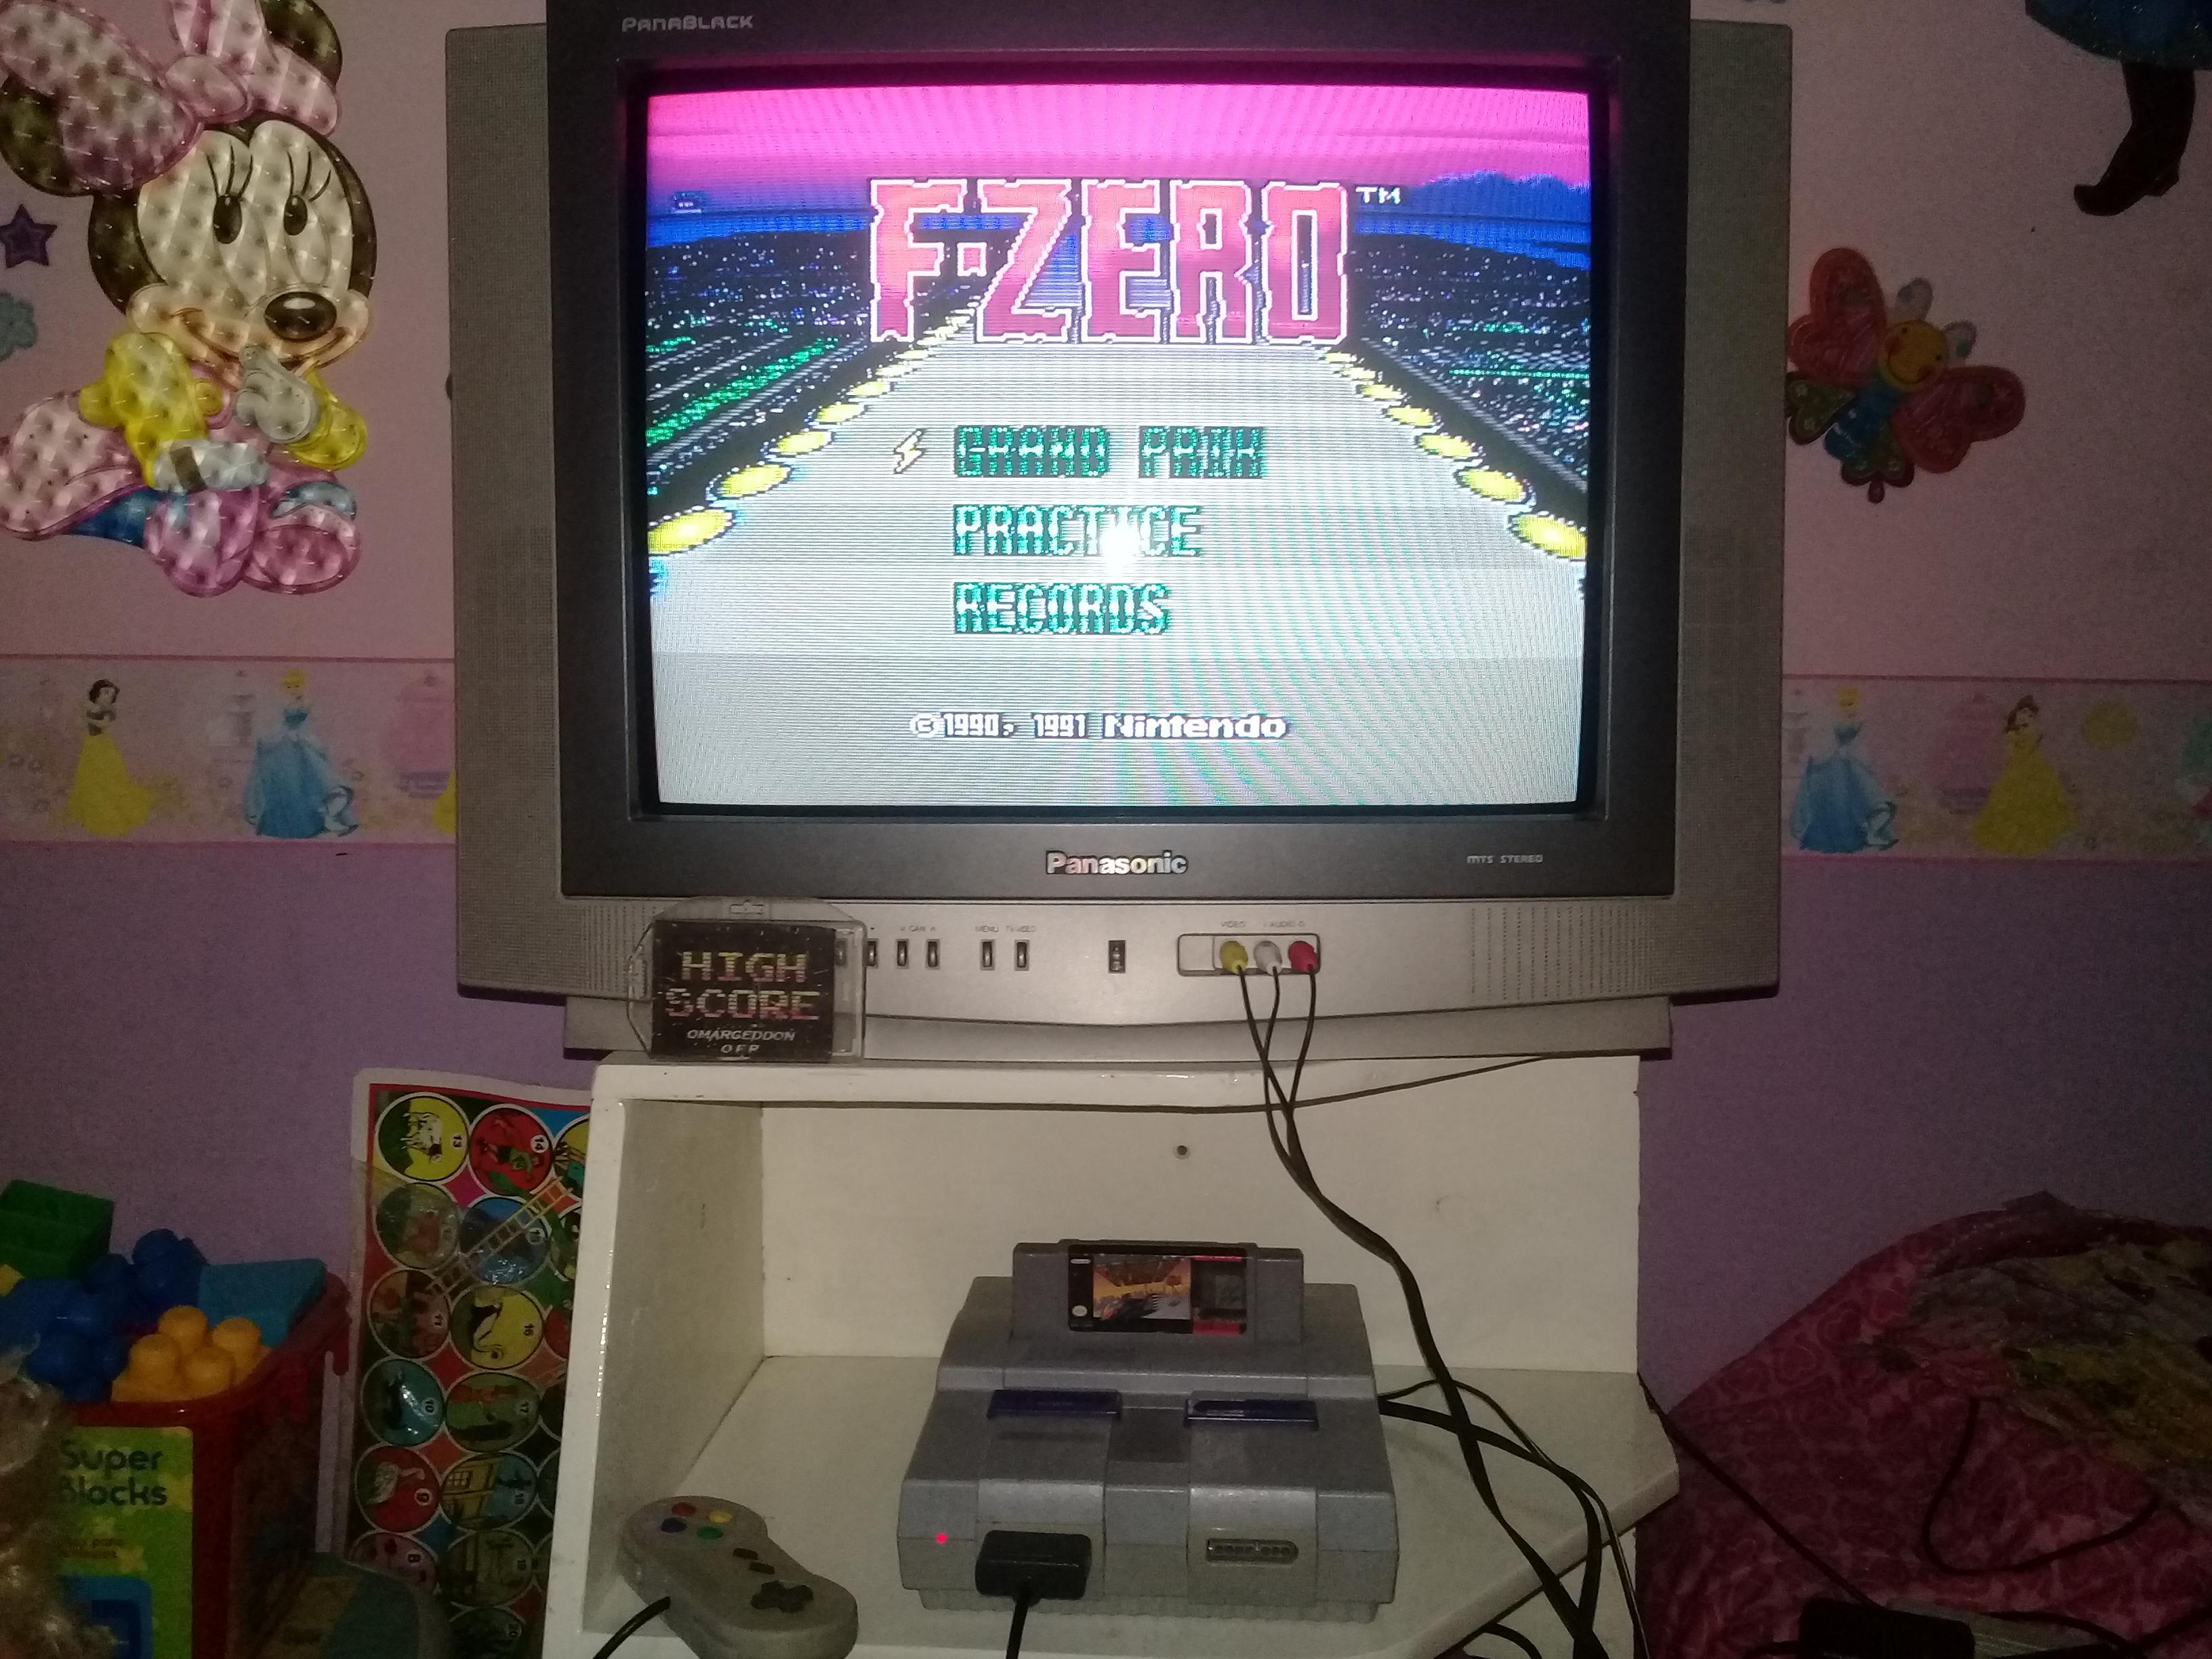 omargeddon: F-Zero: Death Wind I [Beginner] (SNES/Super Famicom) 0:01:51.72 points on 2019-06-14 15:26:31